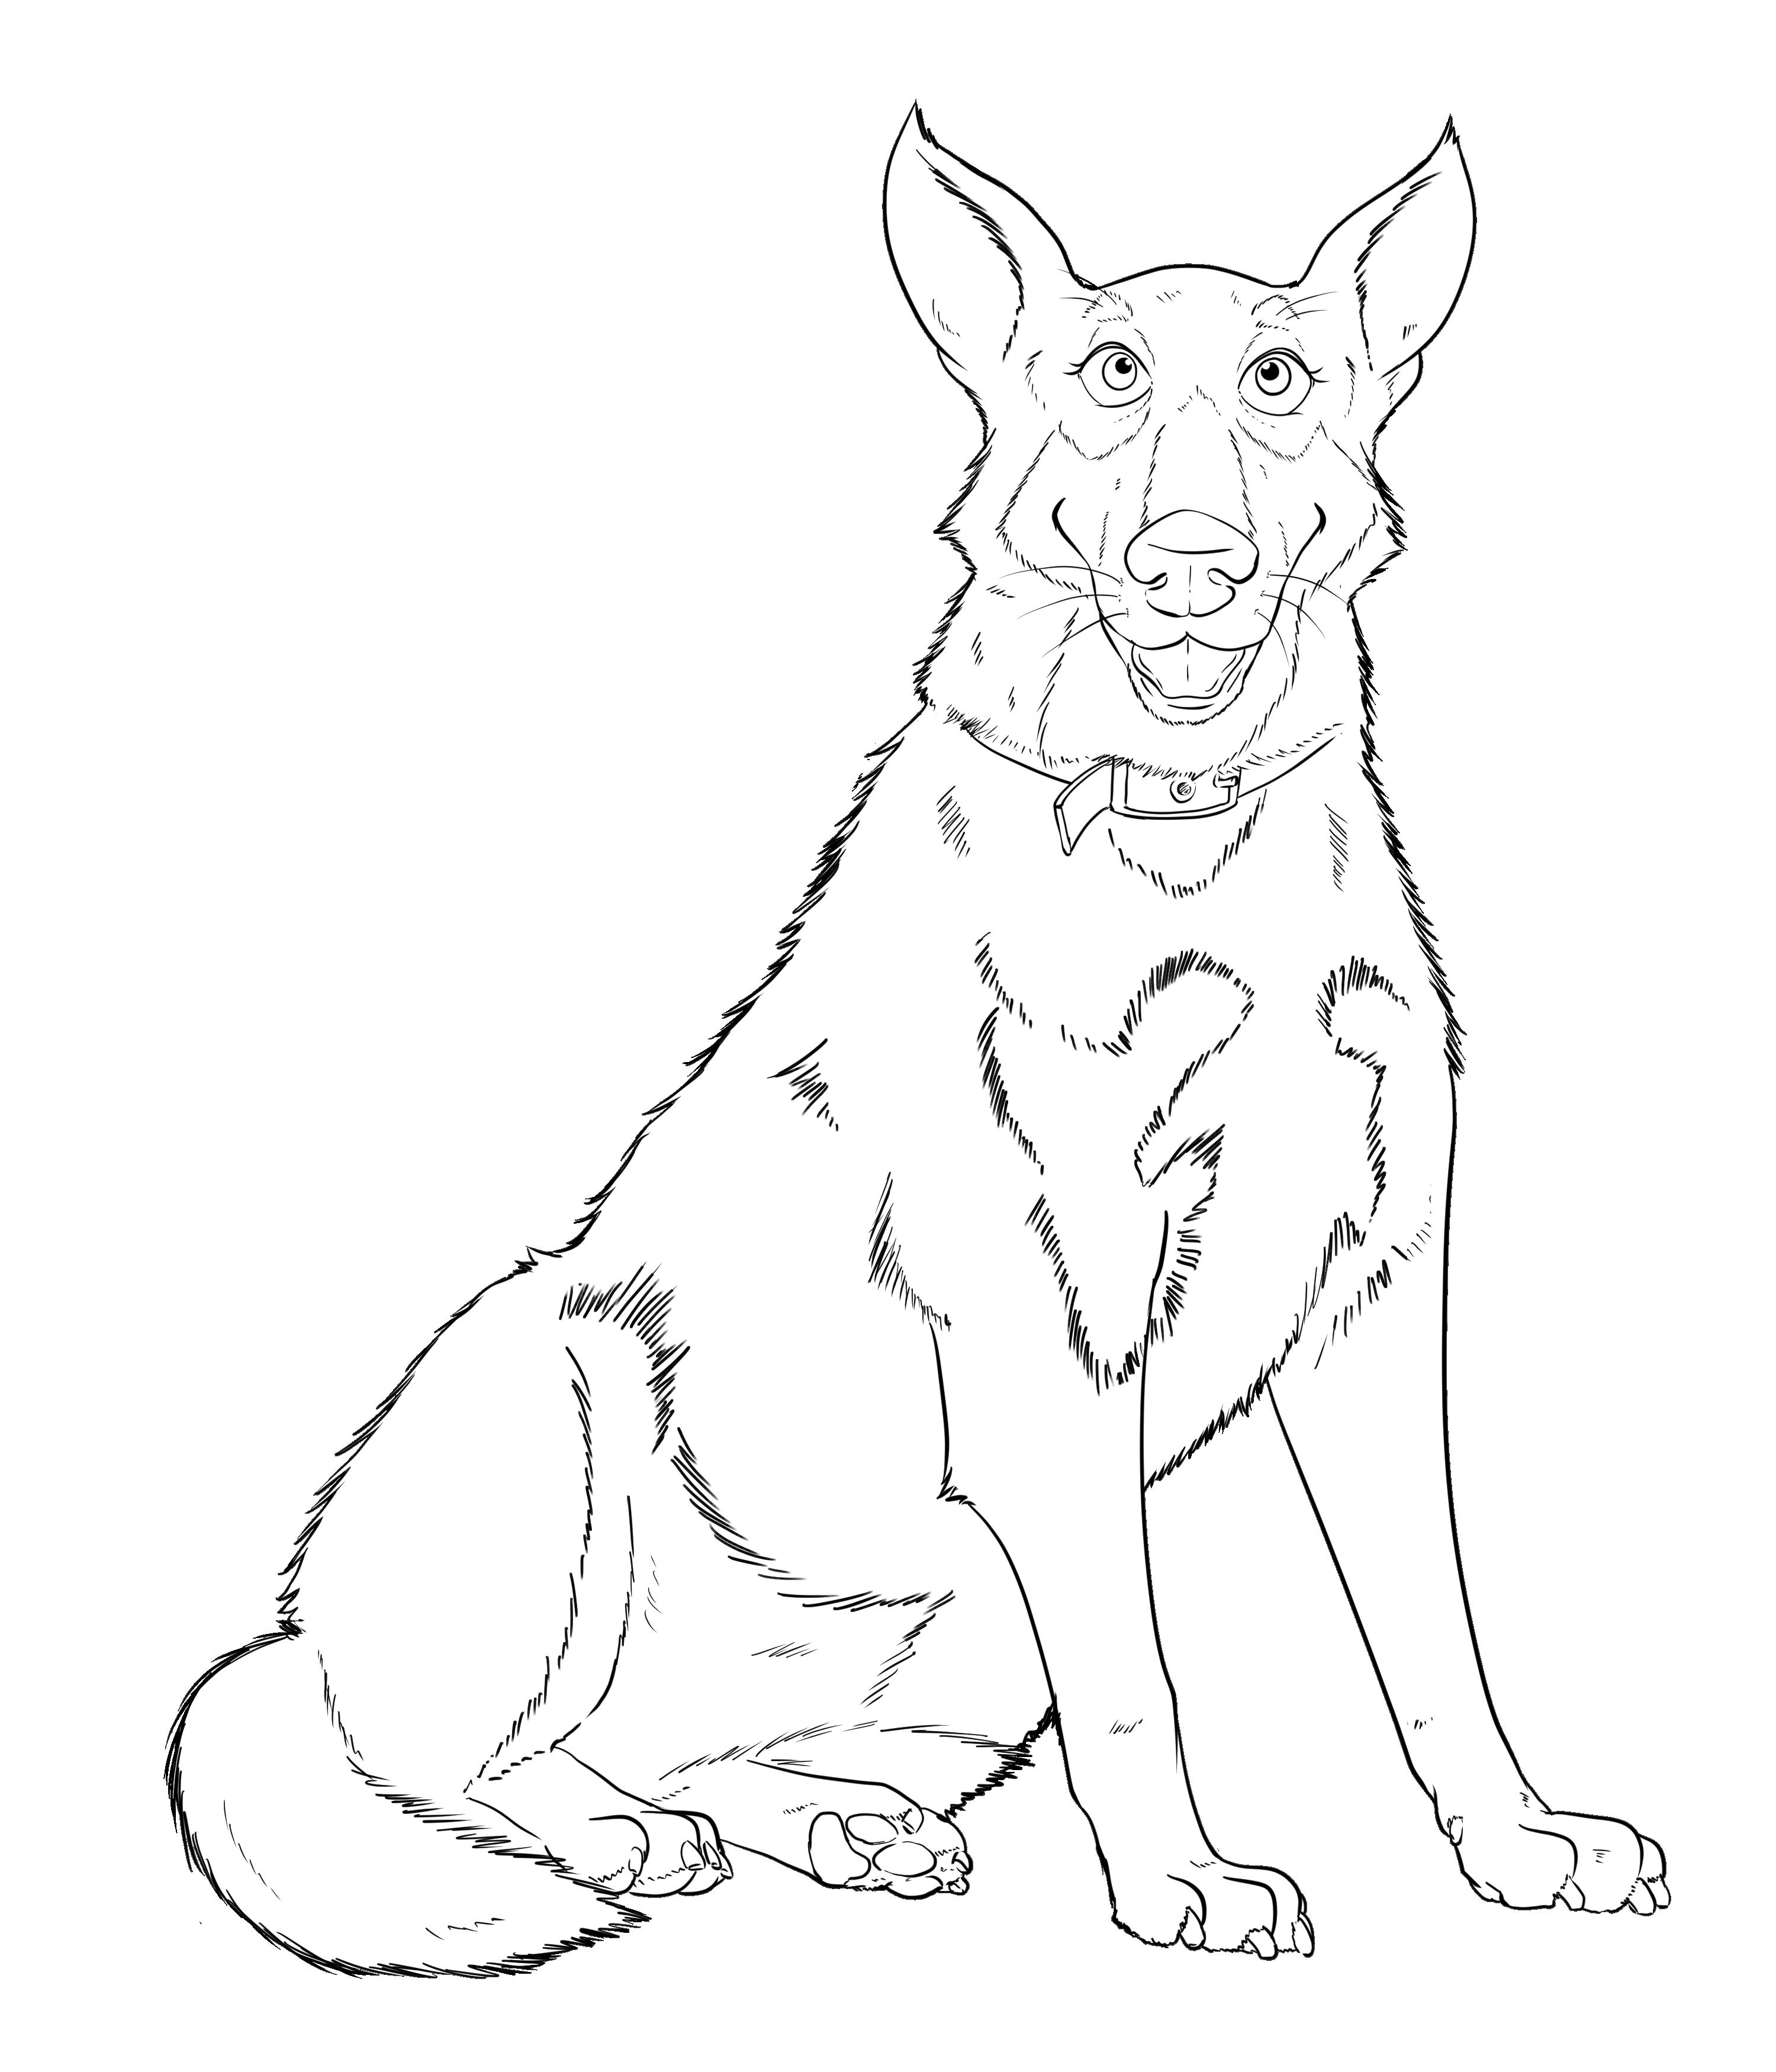 Smily, happy German shepherd dog